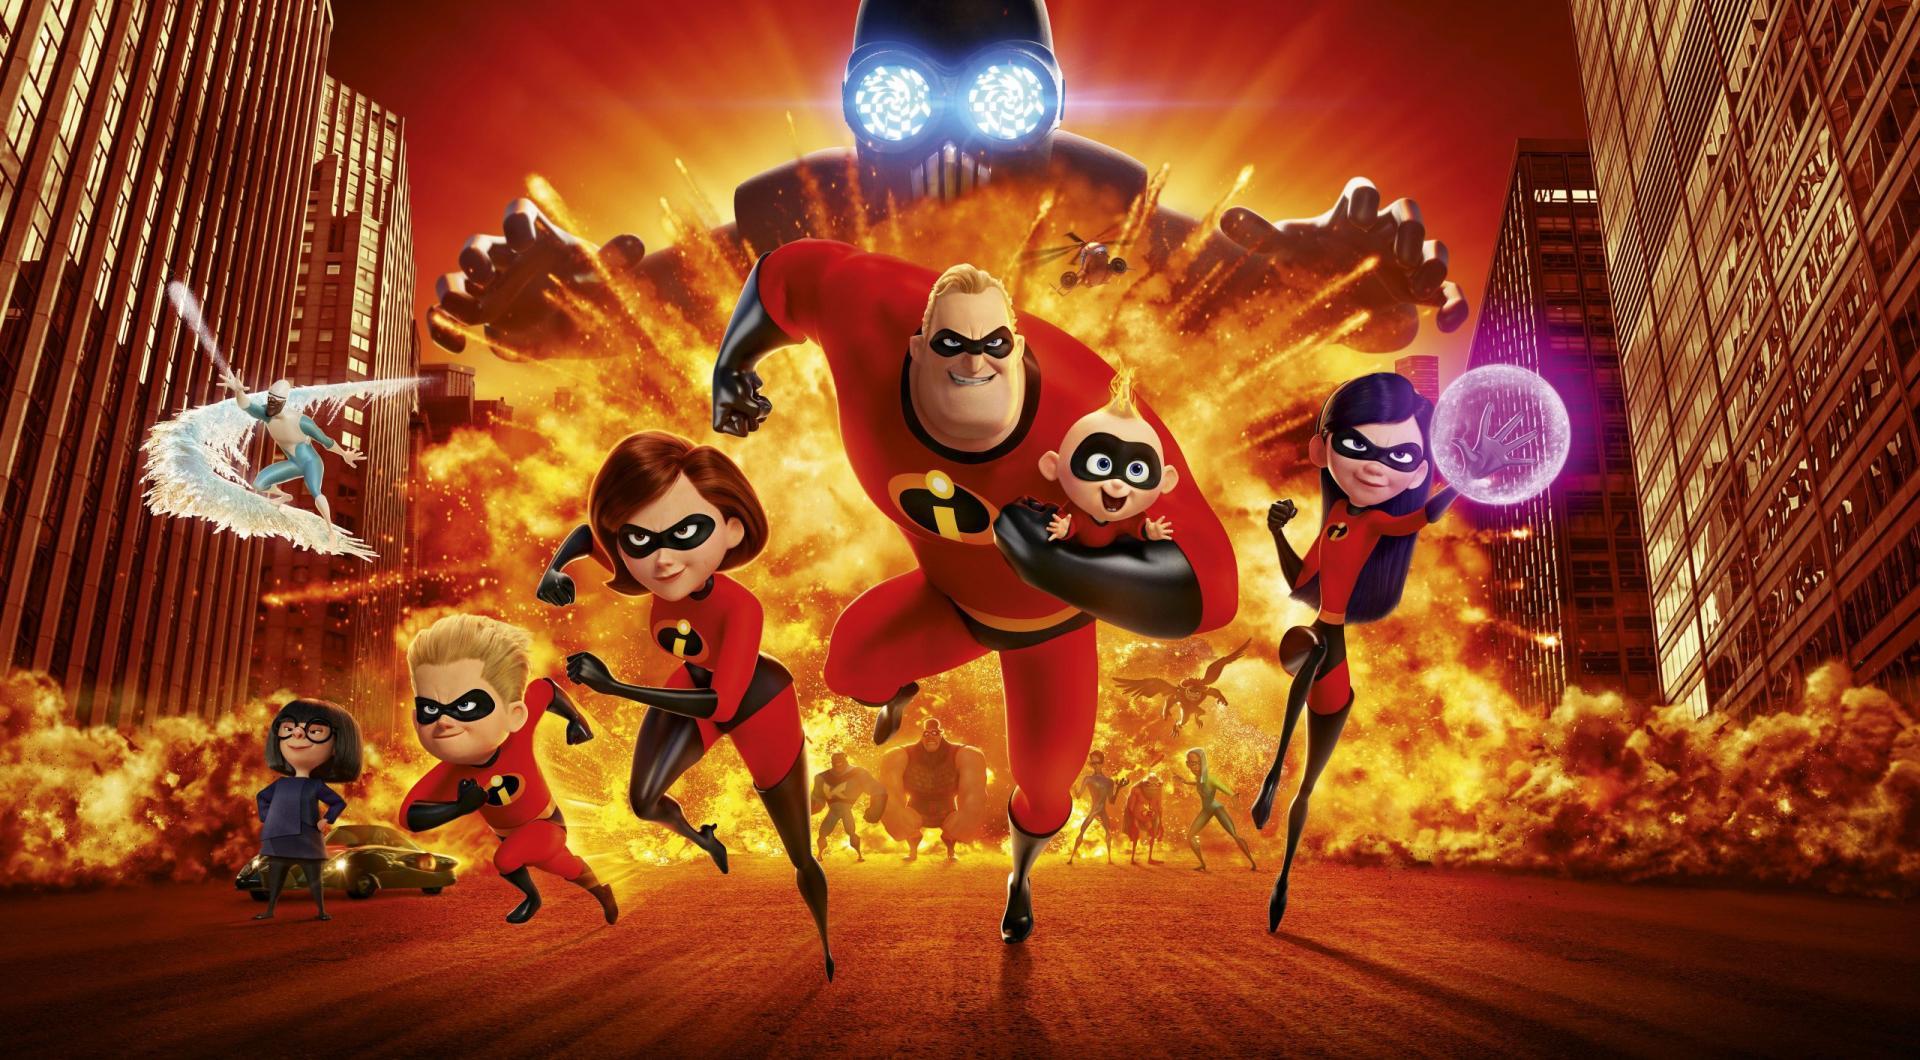 Incredibles 2 animation 4k 8k 2560x1440 e1530718954466